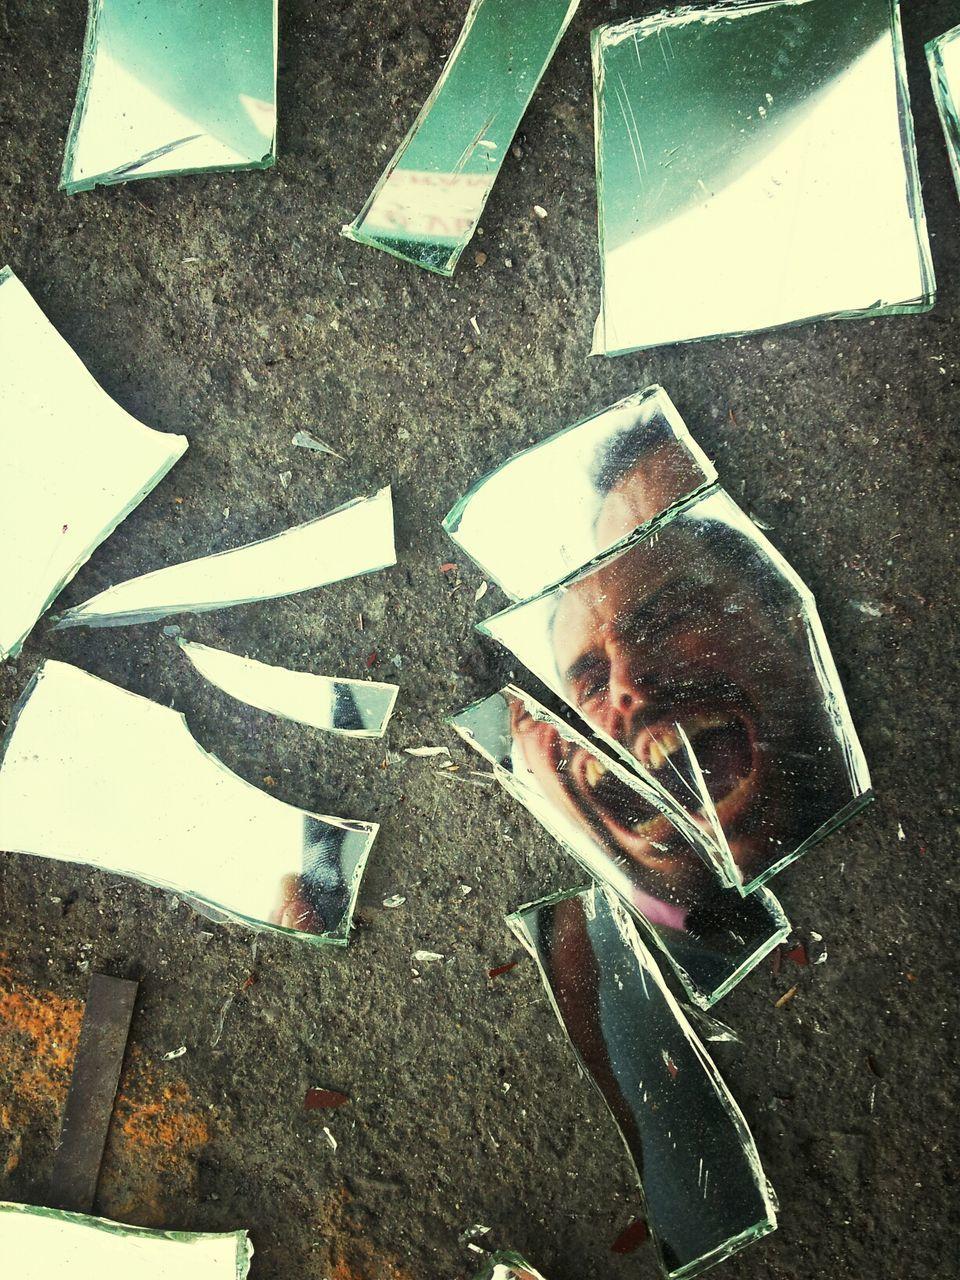 Reflection of man shouting on broken glass